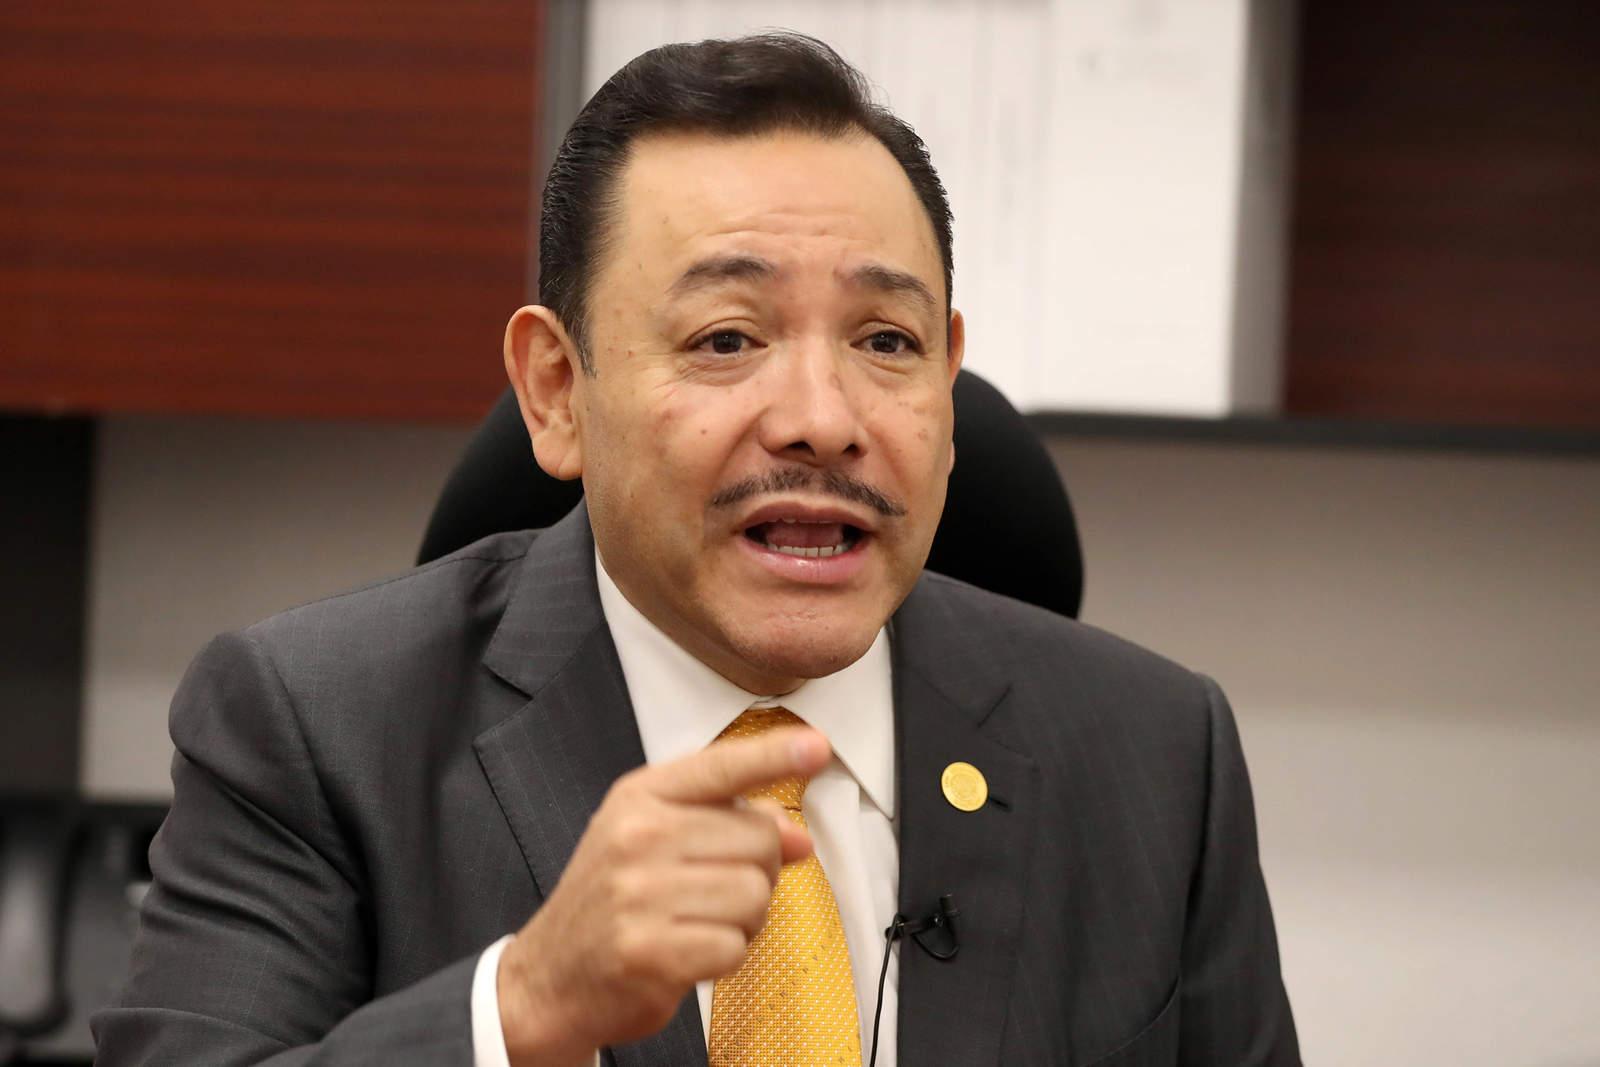 Amenazan a diputados con expulsión por votar a favor de iniciativa de AMLO